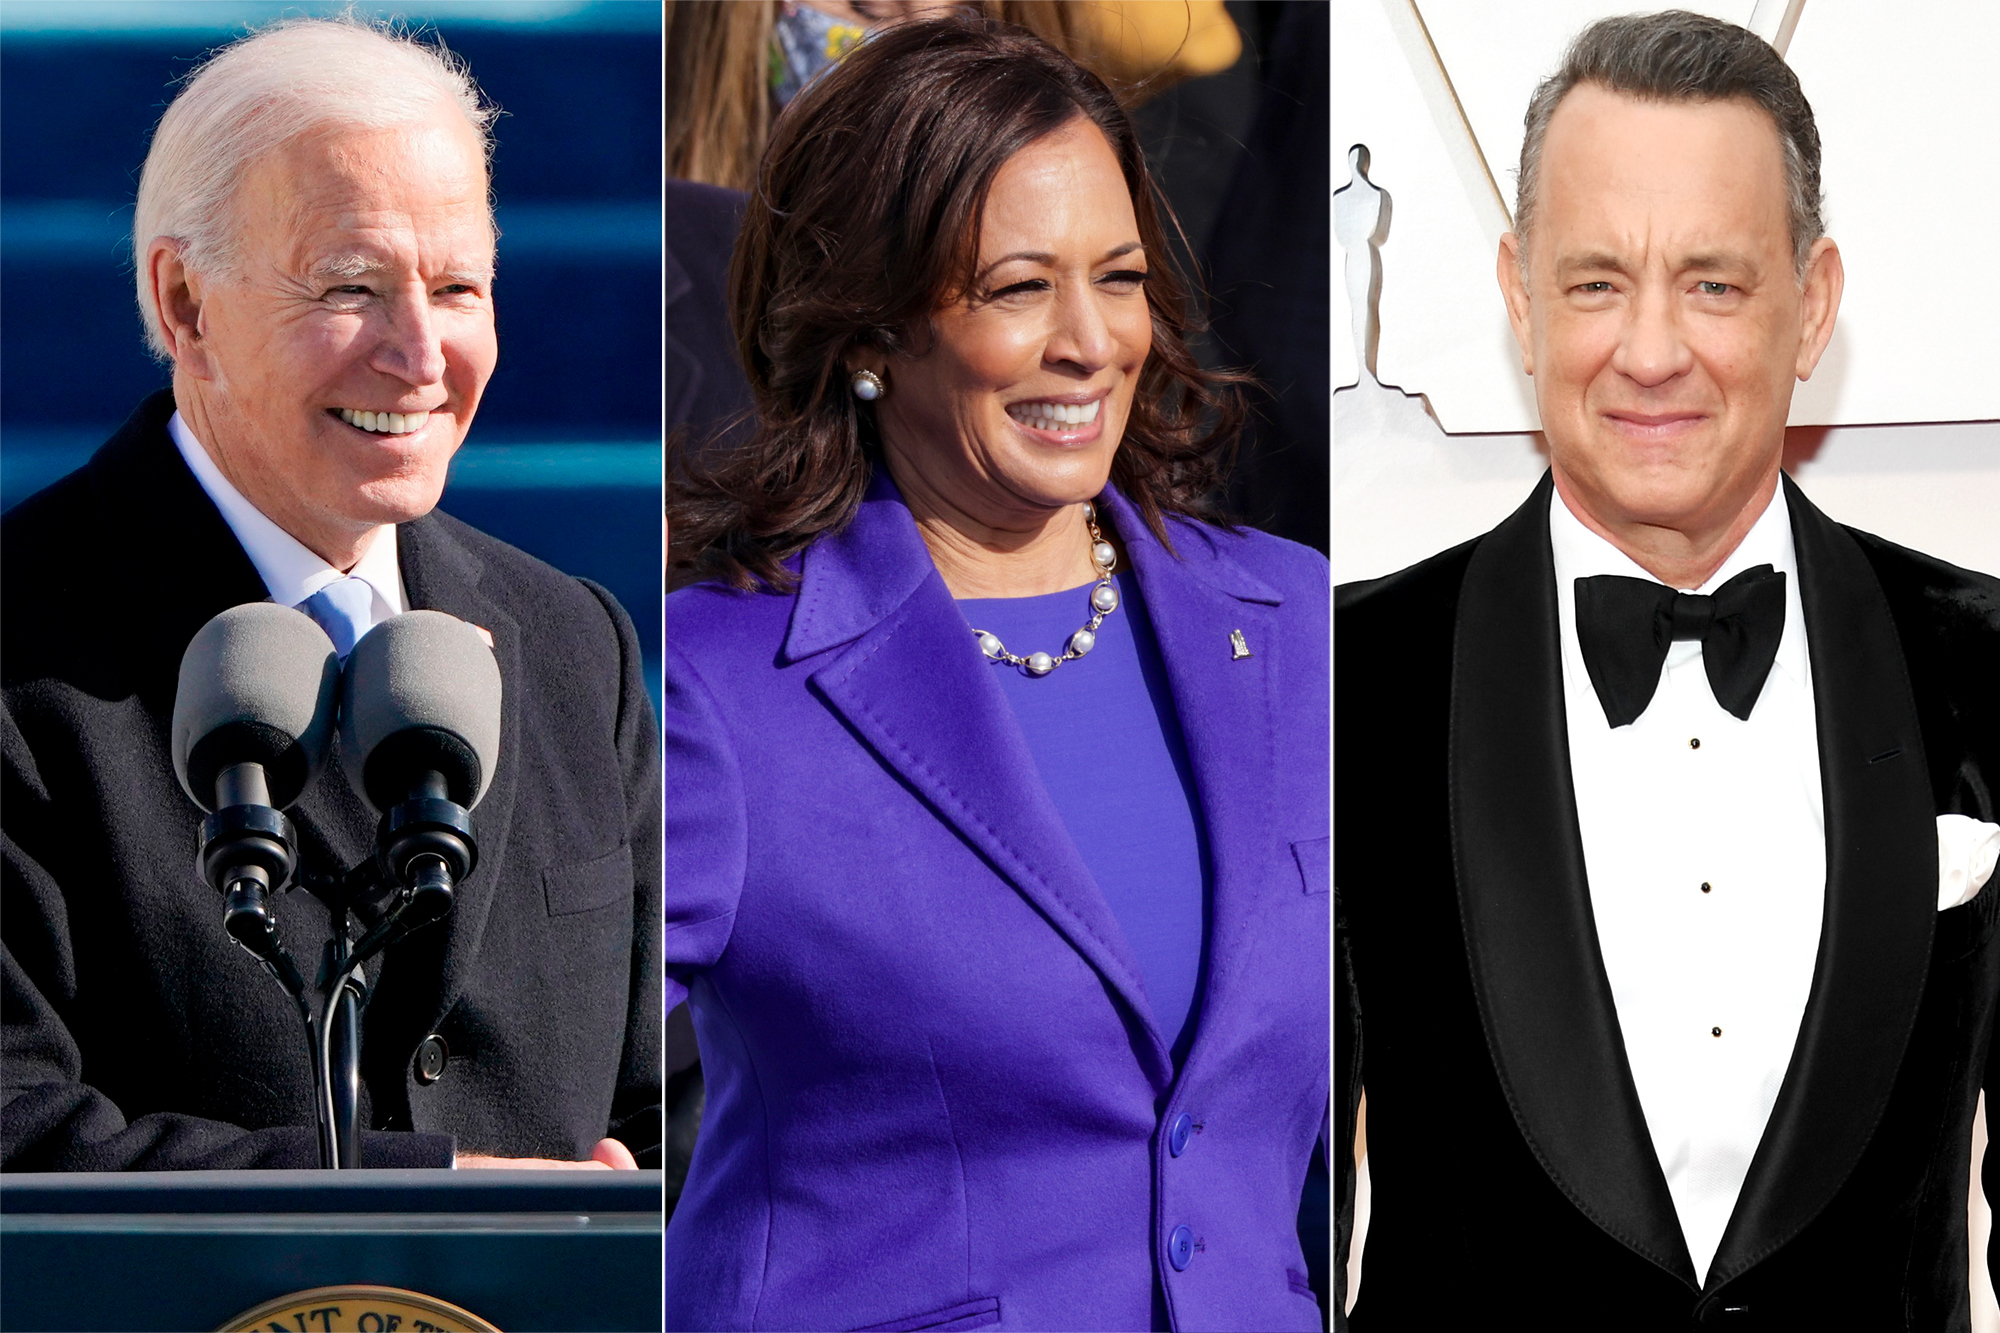 Joe Biden, Kamala Harris, Tom Hanks